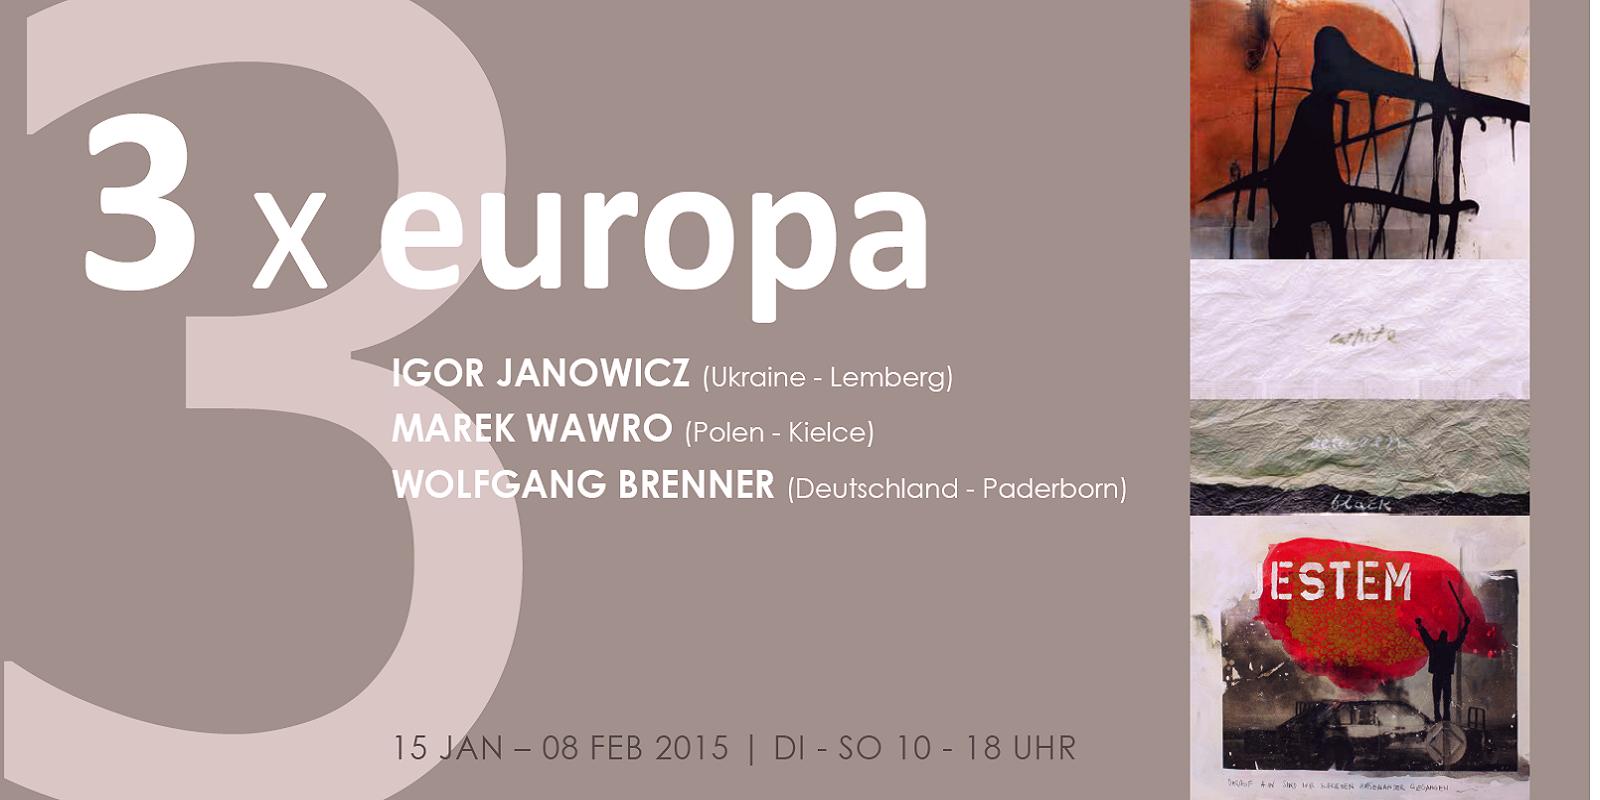 3 x europa | Igor Janowicz | Marek Wawro | Wolfgang Brenner